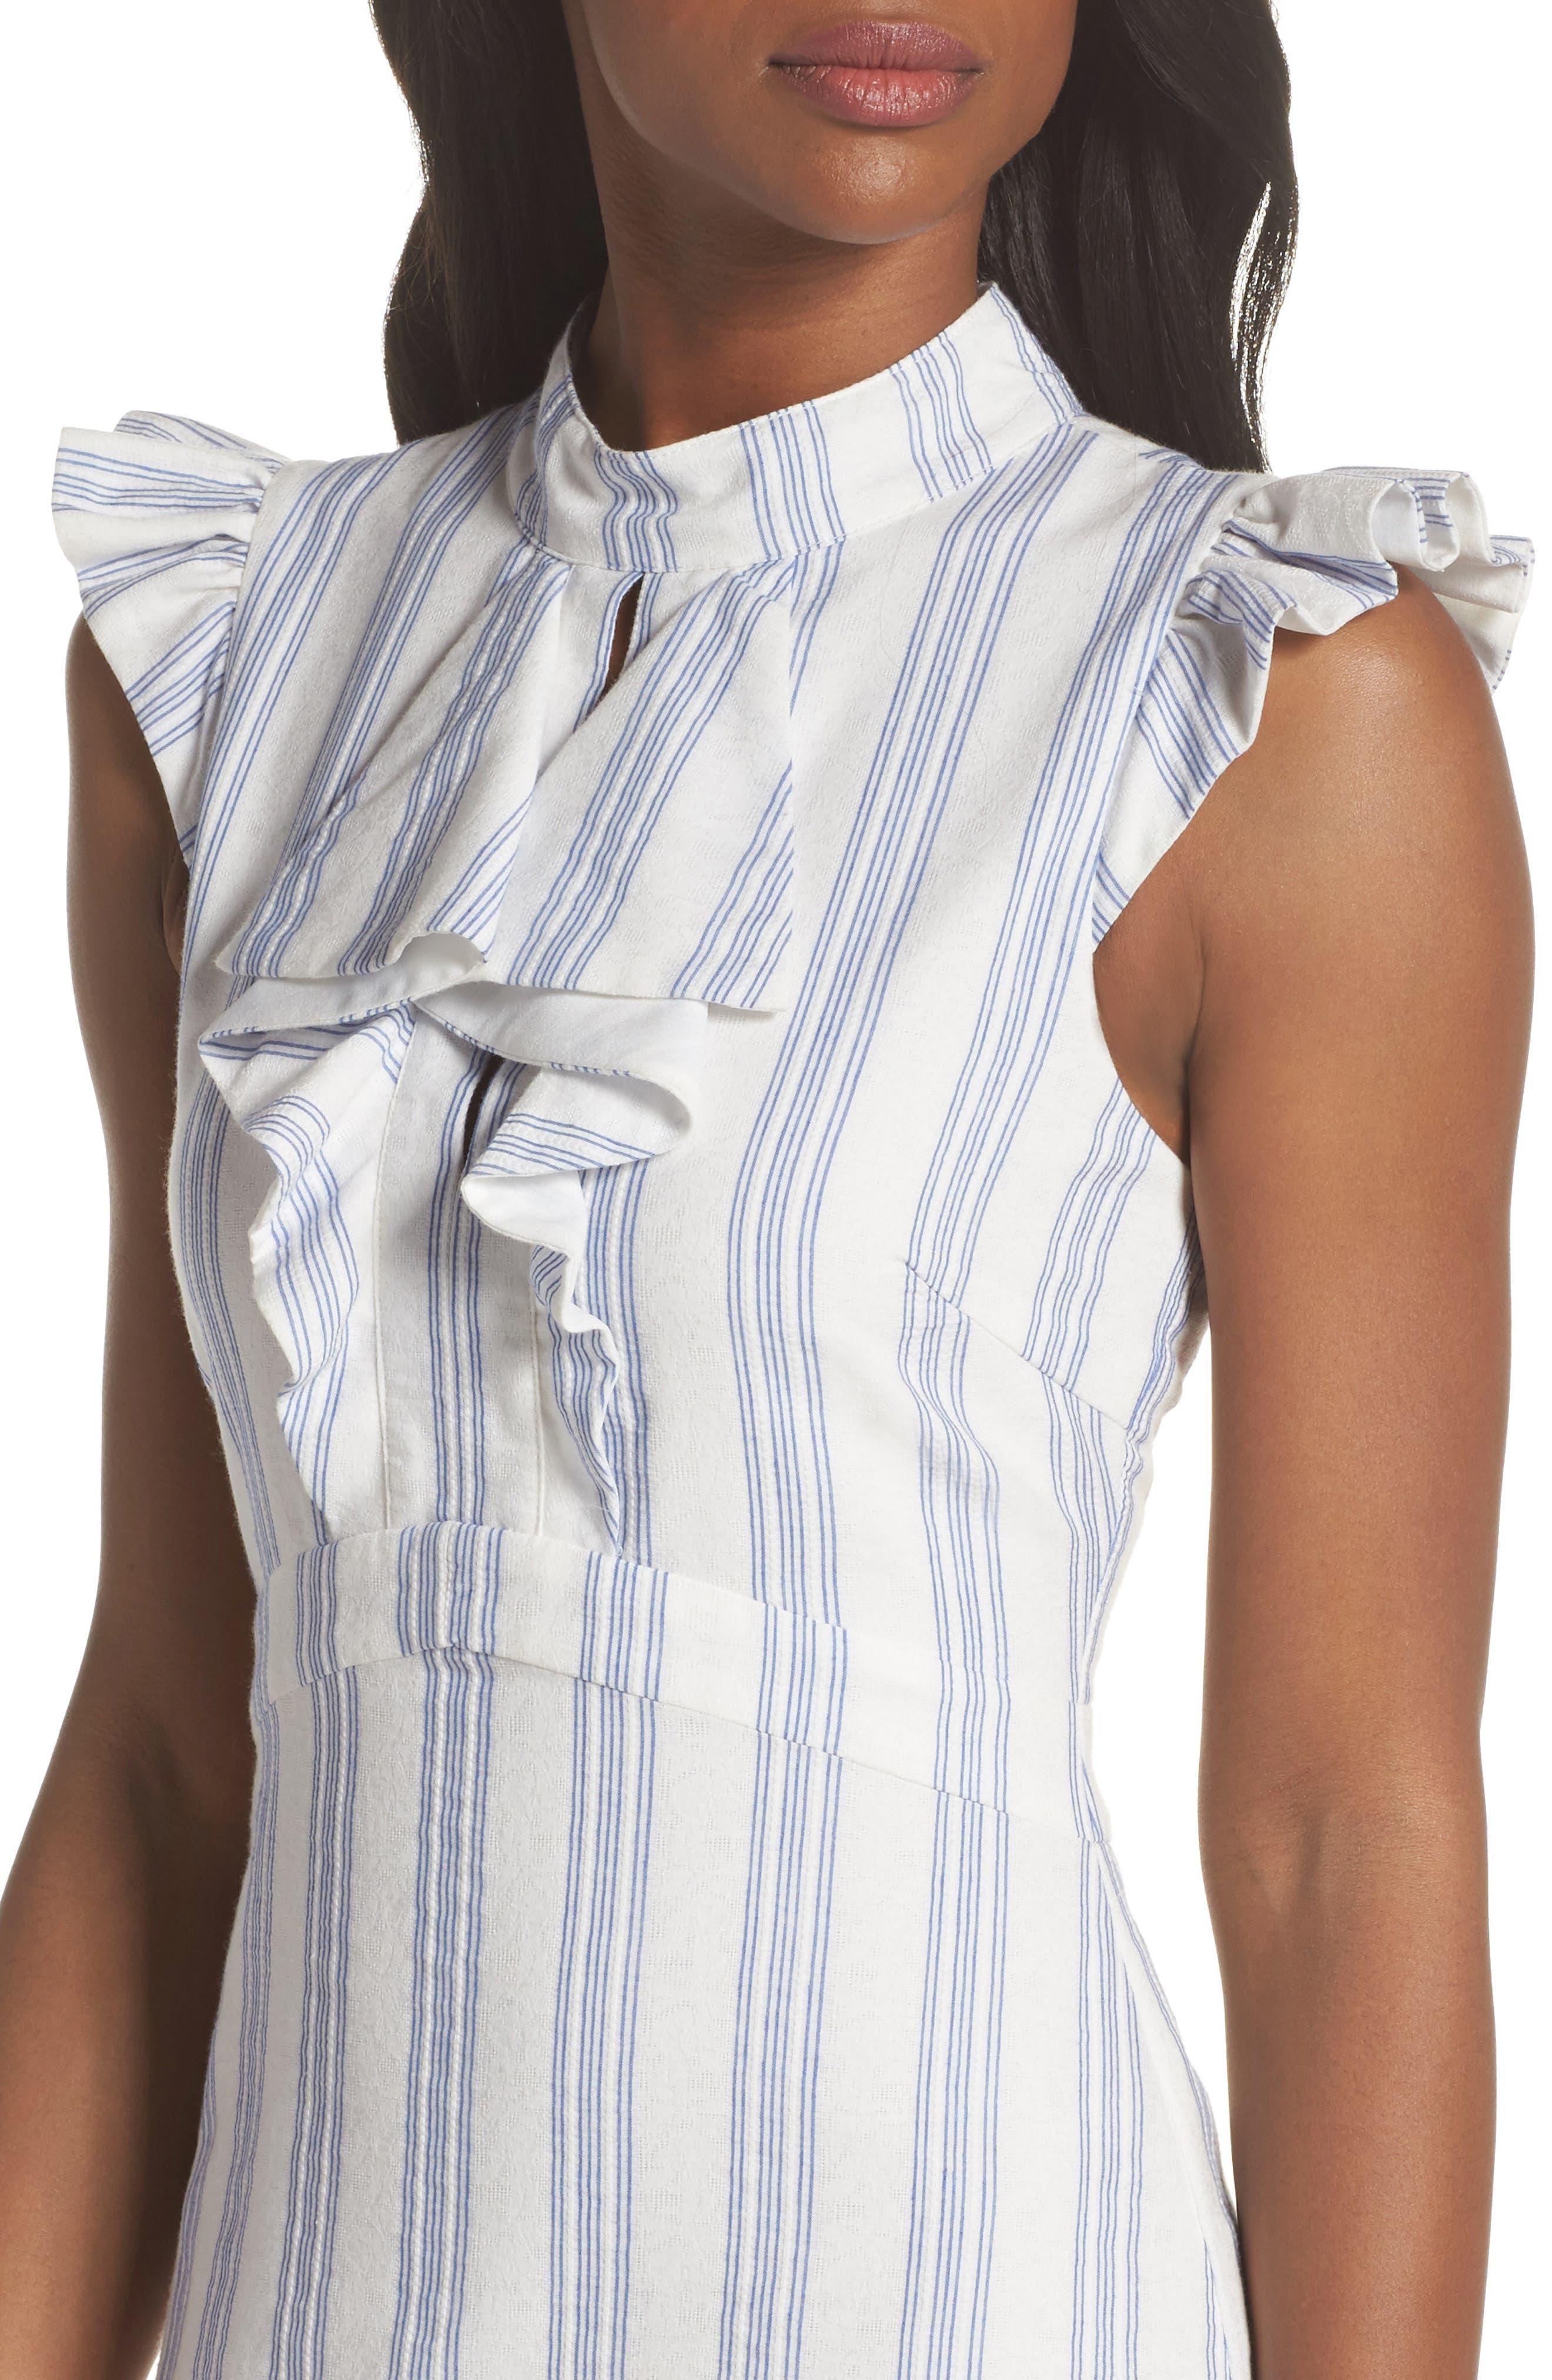 Stripe Ruffle Sheath Dress,                             Alternate thumbnail 4, color,                             White/ Blue